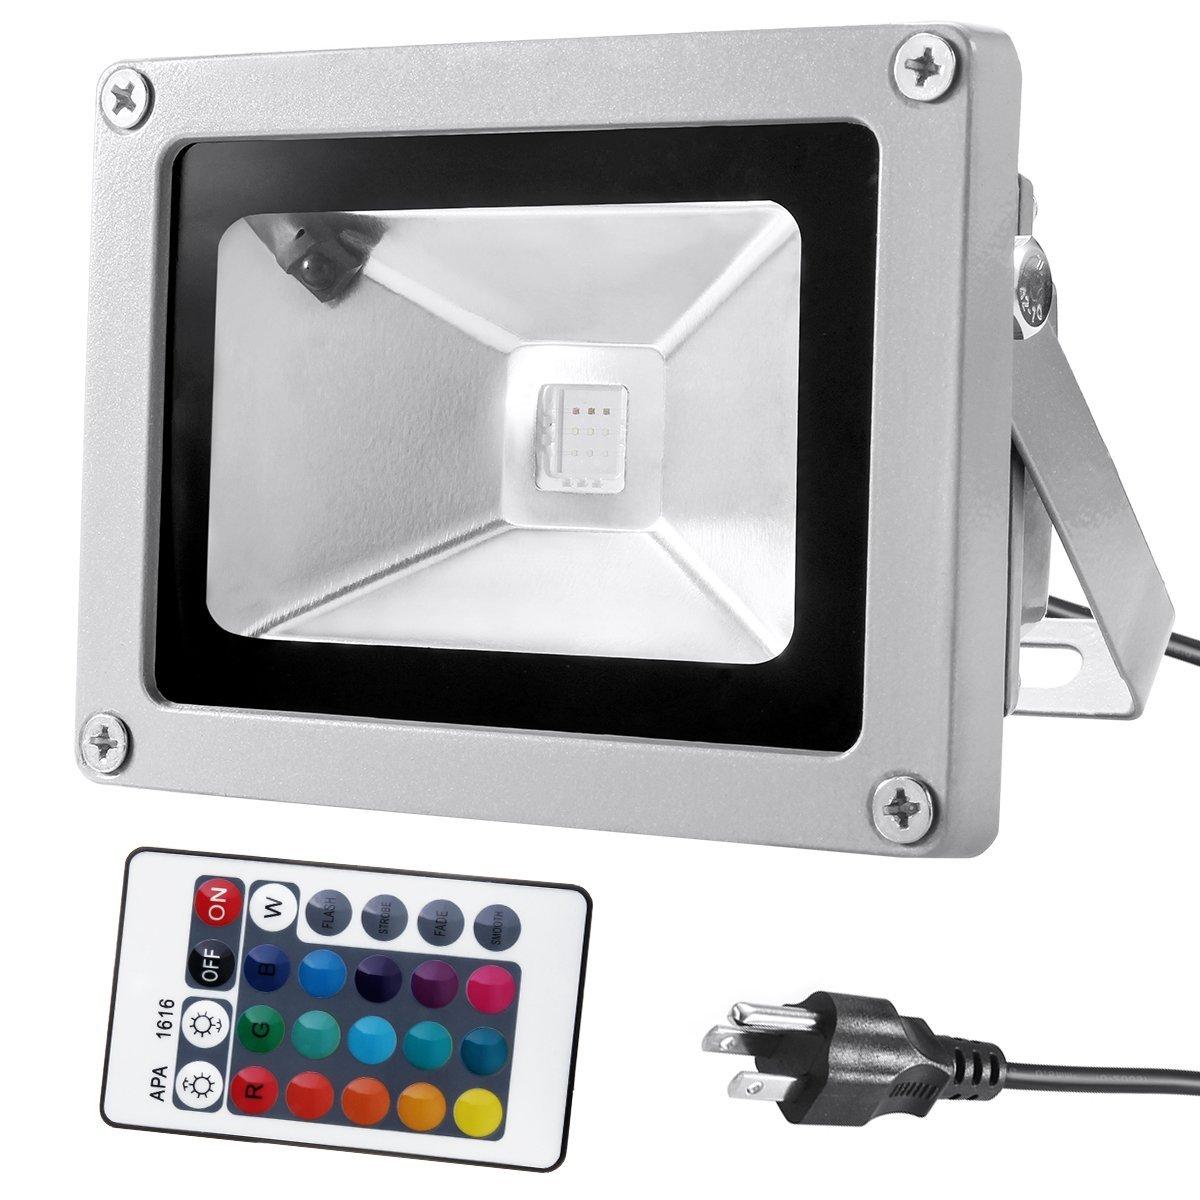 warmoon 10w waterproof led flood light with us 3-plug and ... lithonia flood light wiring diagram 480 volt